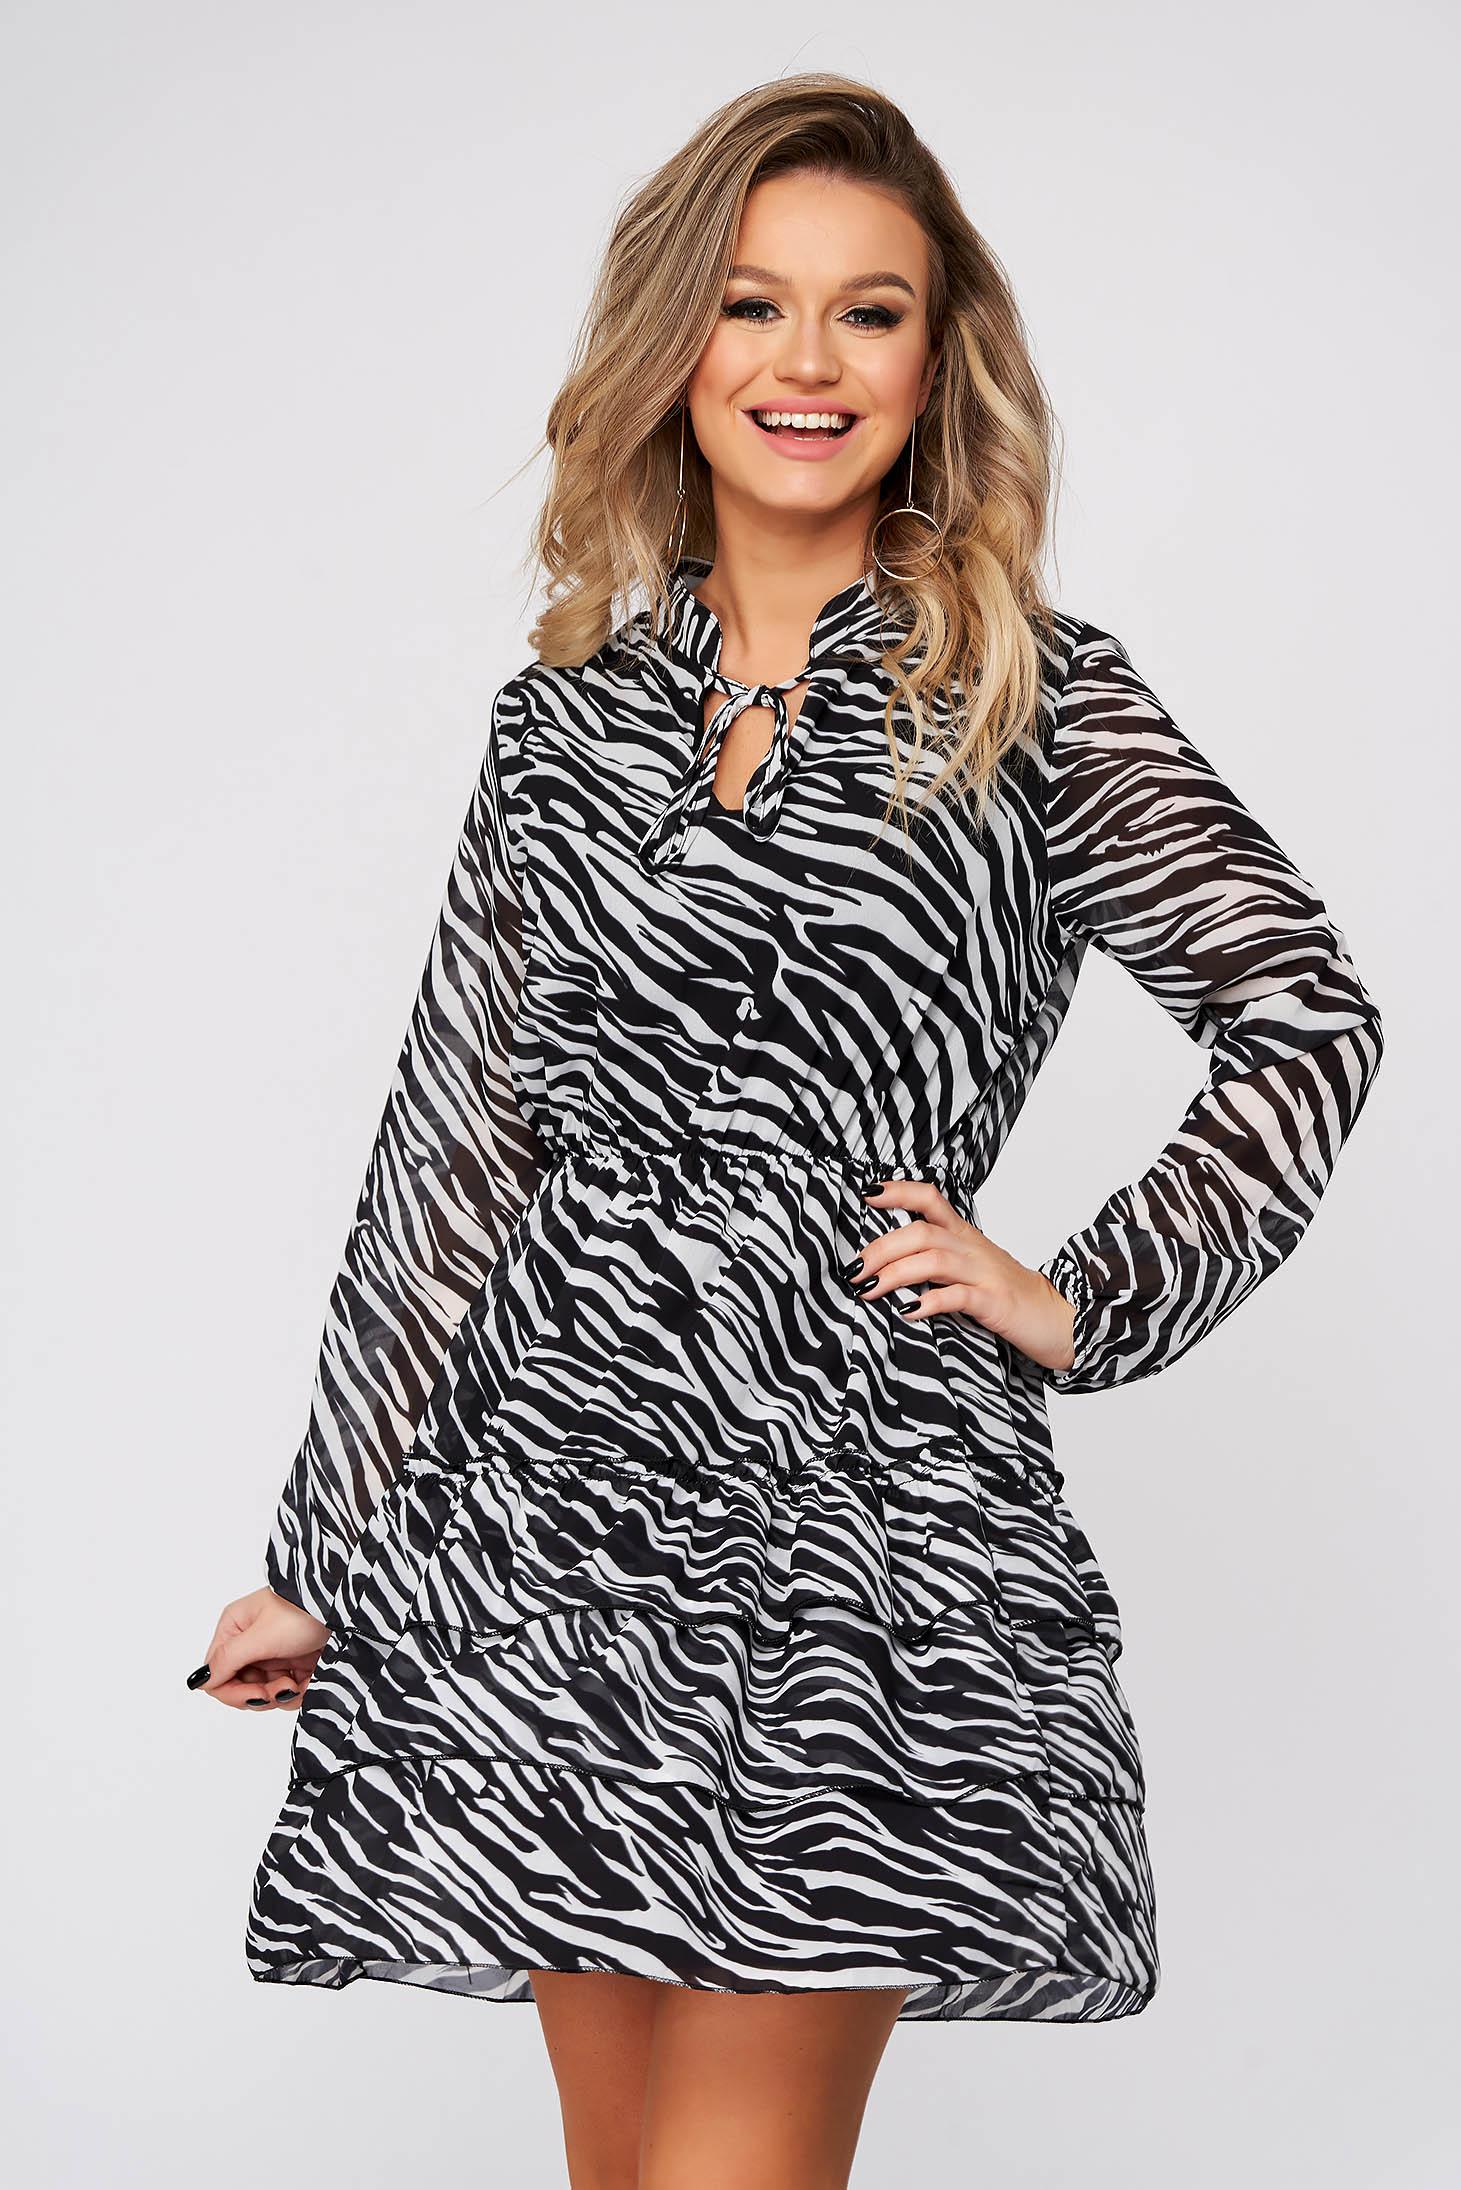 Rochie SunShine neagra de zi scurta clos cu elastic in talie din voal cu volanase la baza rochiei